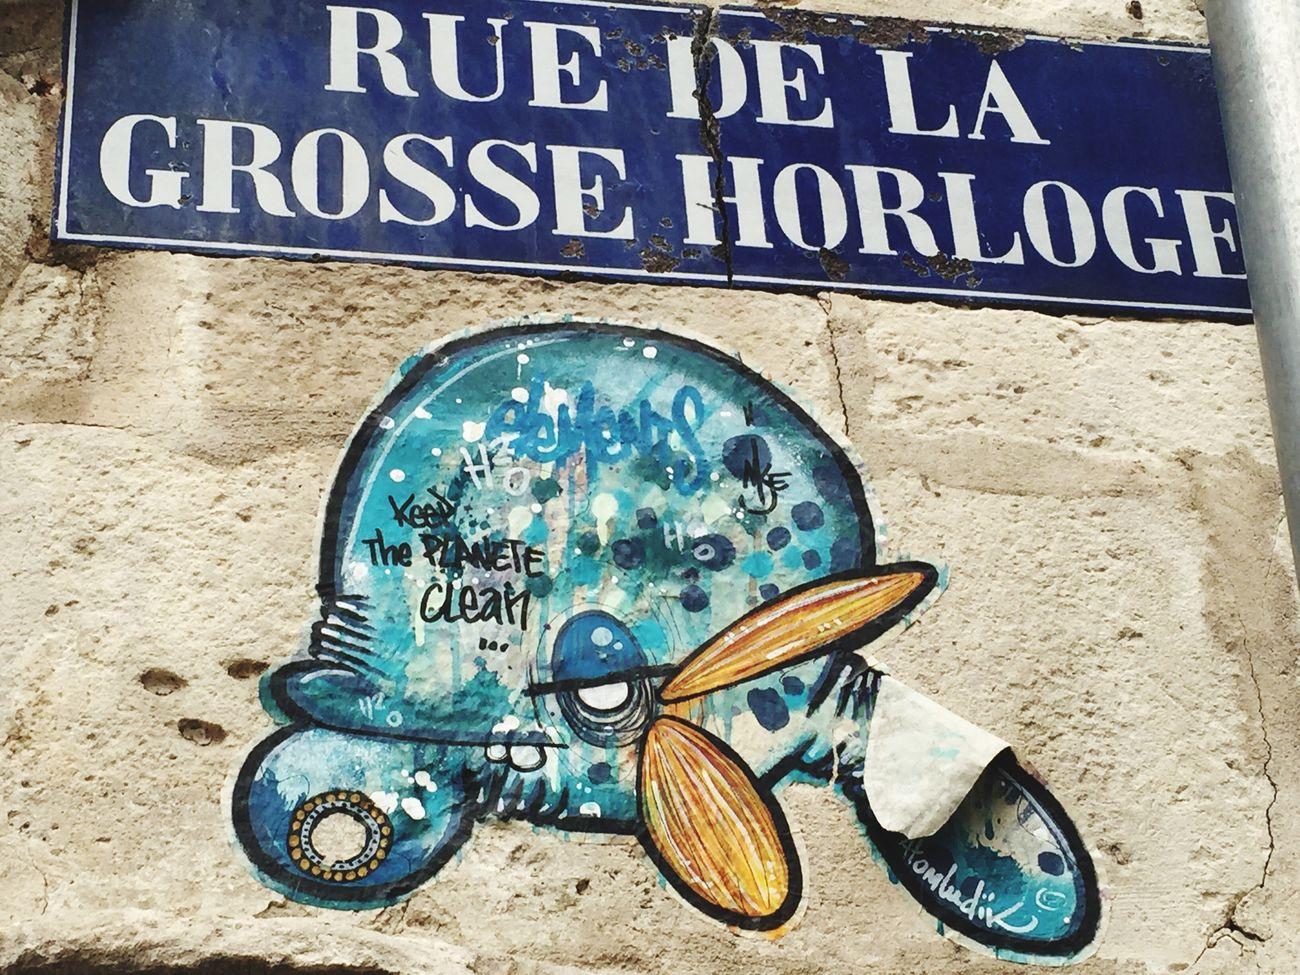 Streetphotography Whale Graffiti